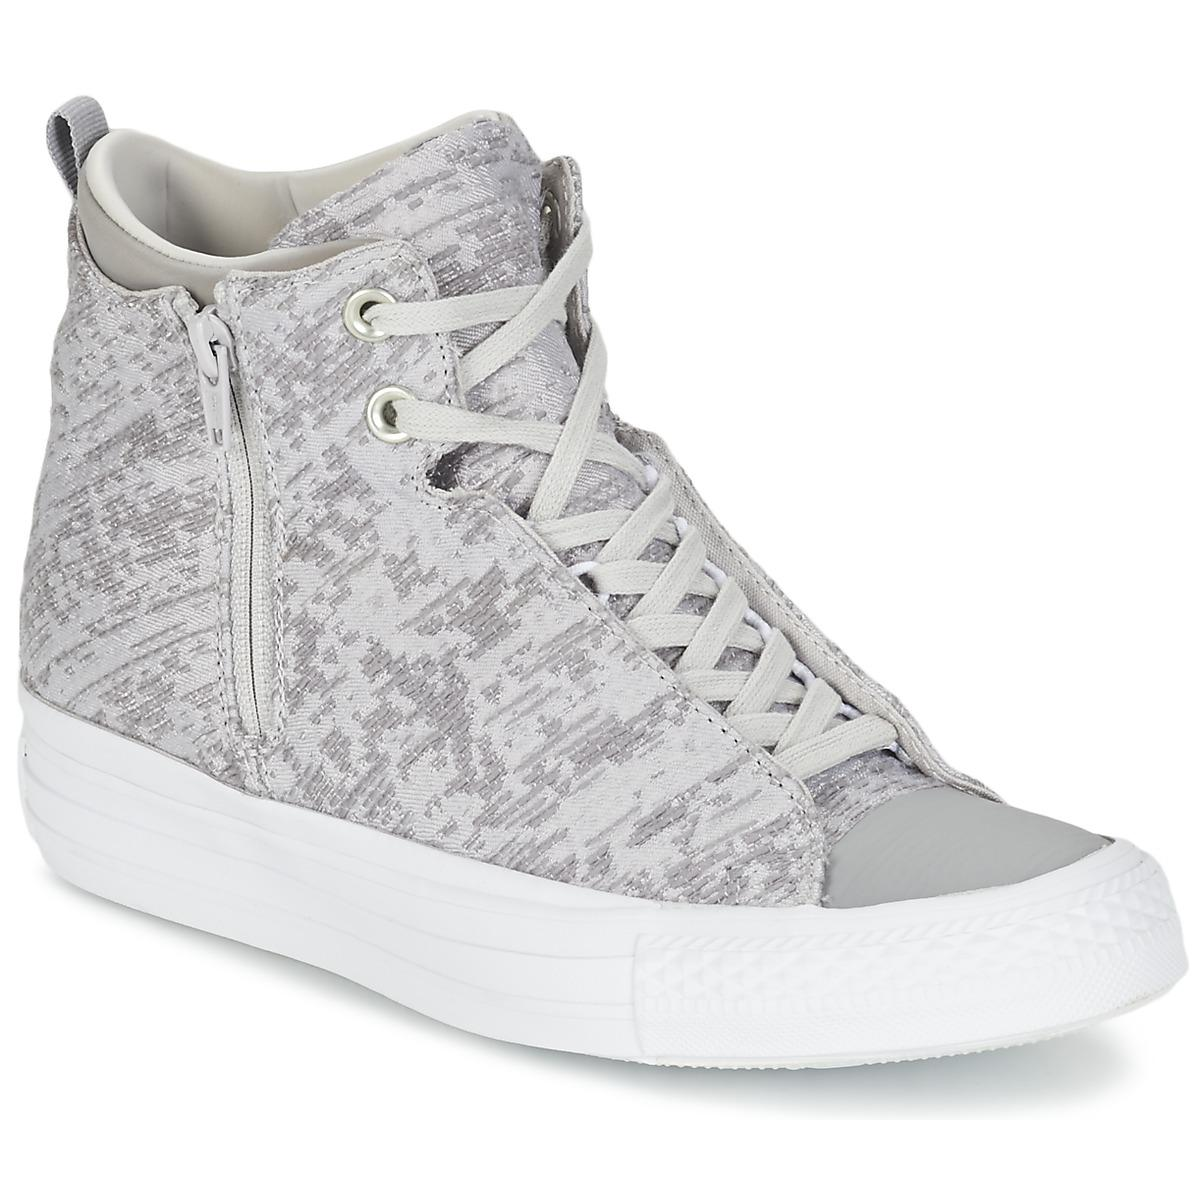 a00fabc1b5bc Converse. Gray Chuck Taylor All Star Selene Women s Shoes (high-top ...